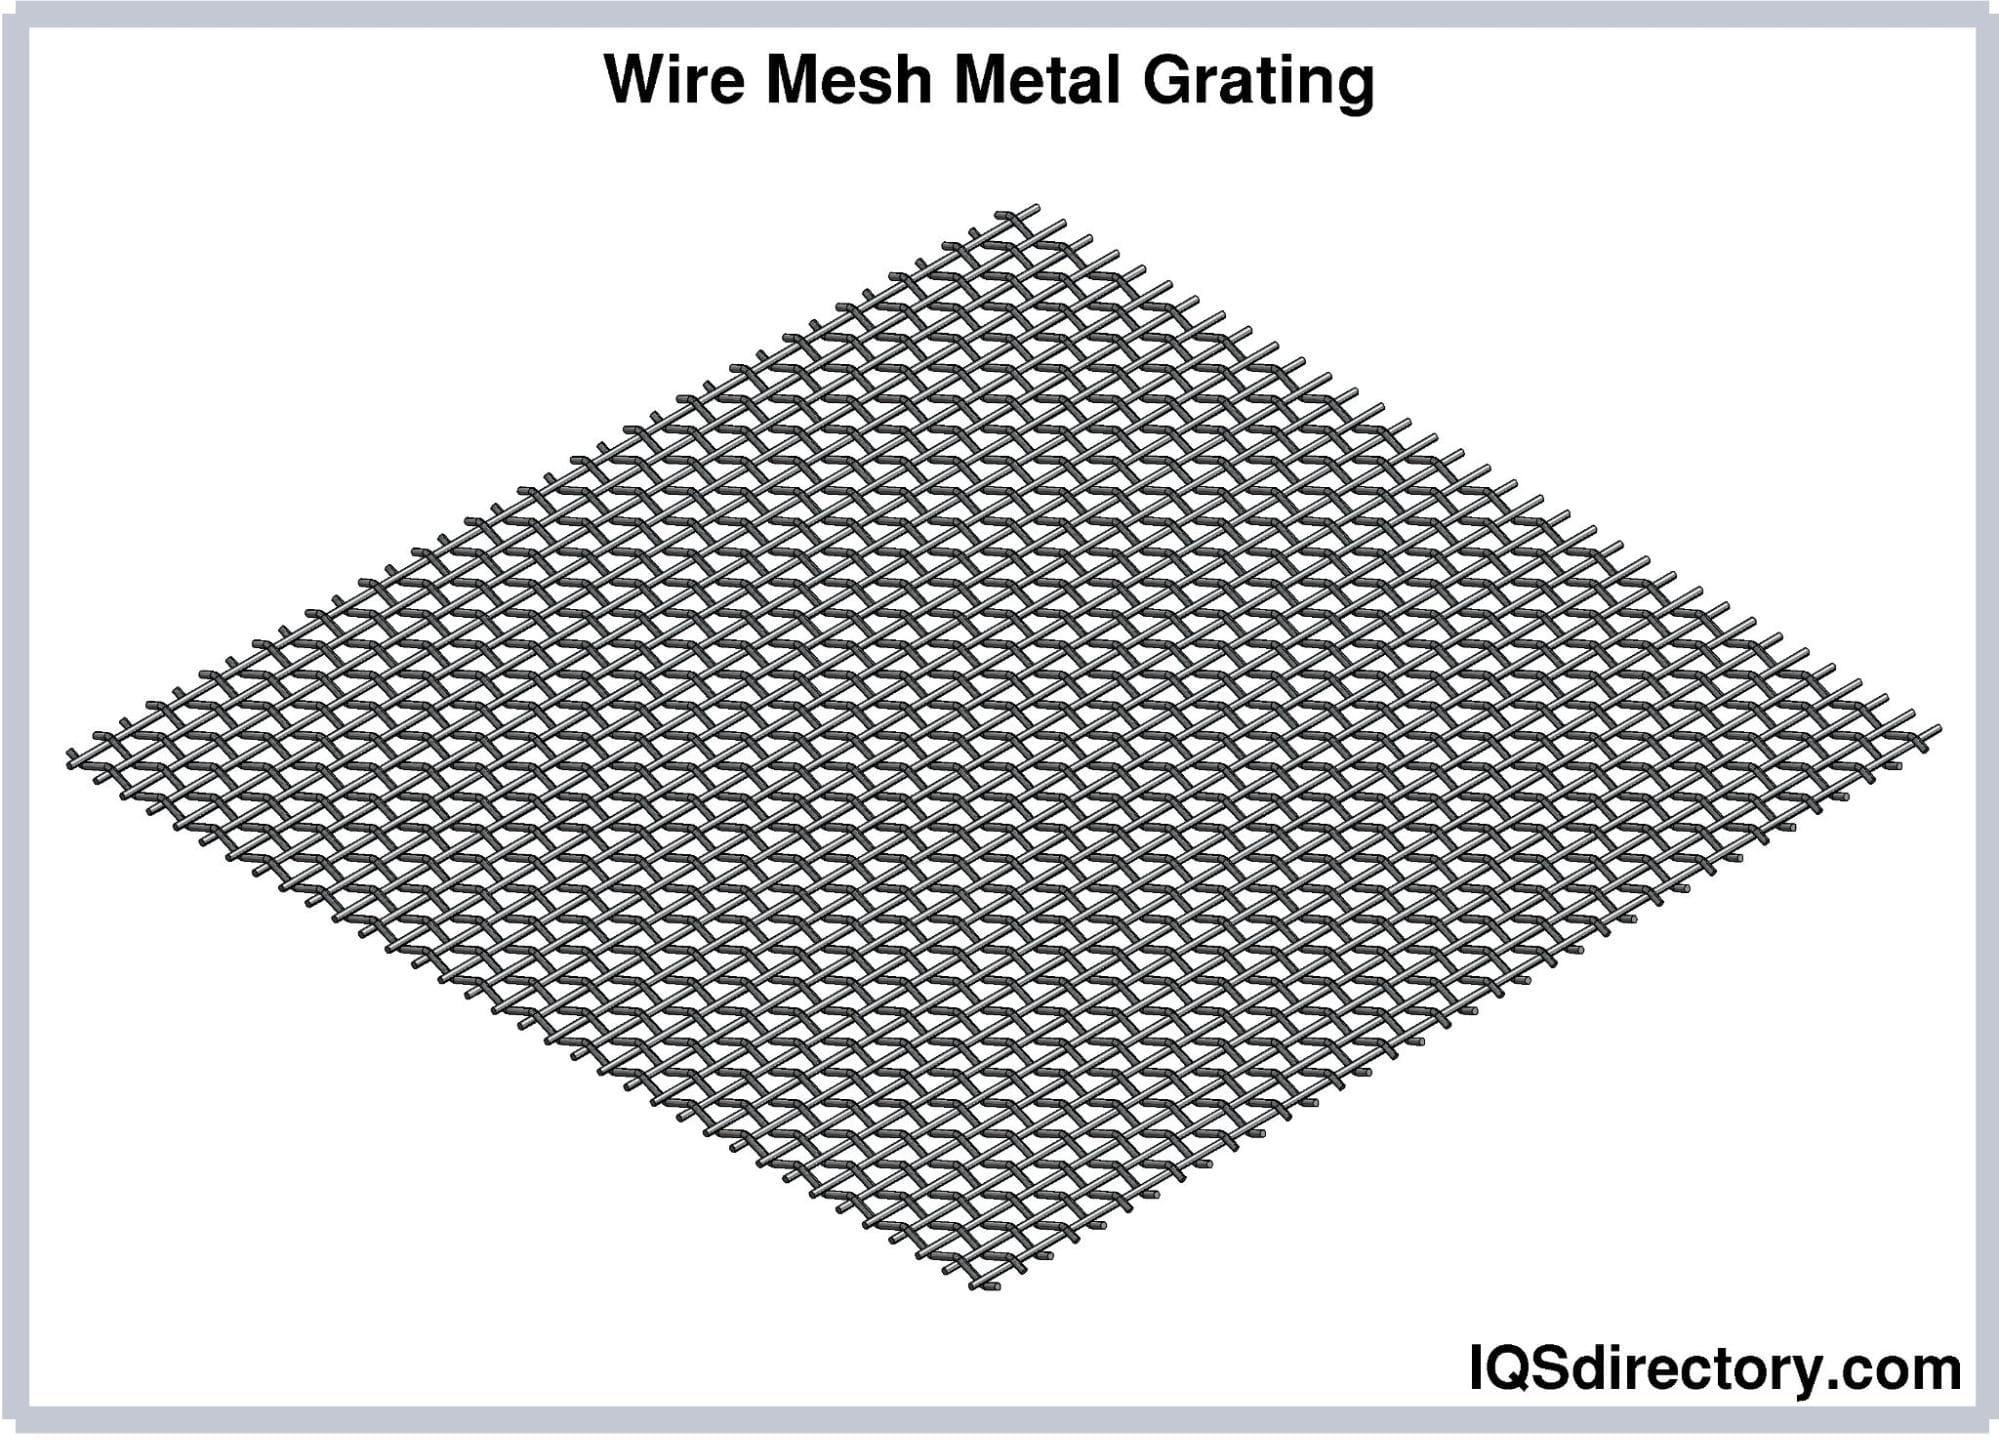 Wire Mesh Metal Grating